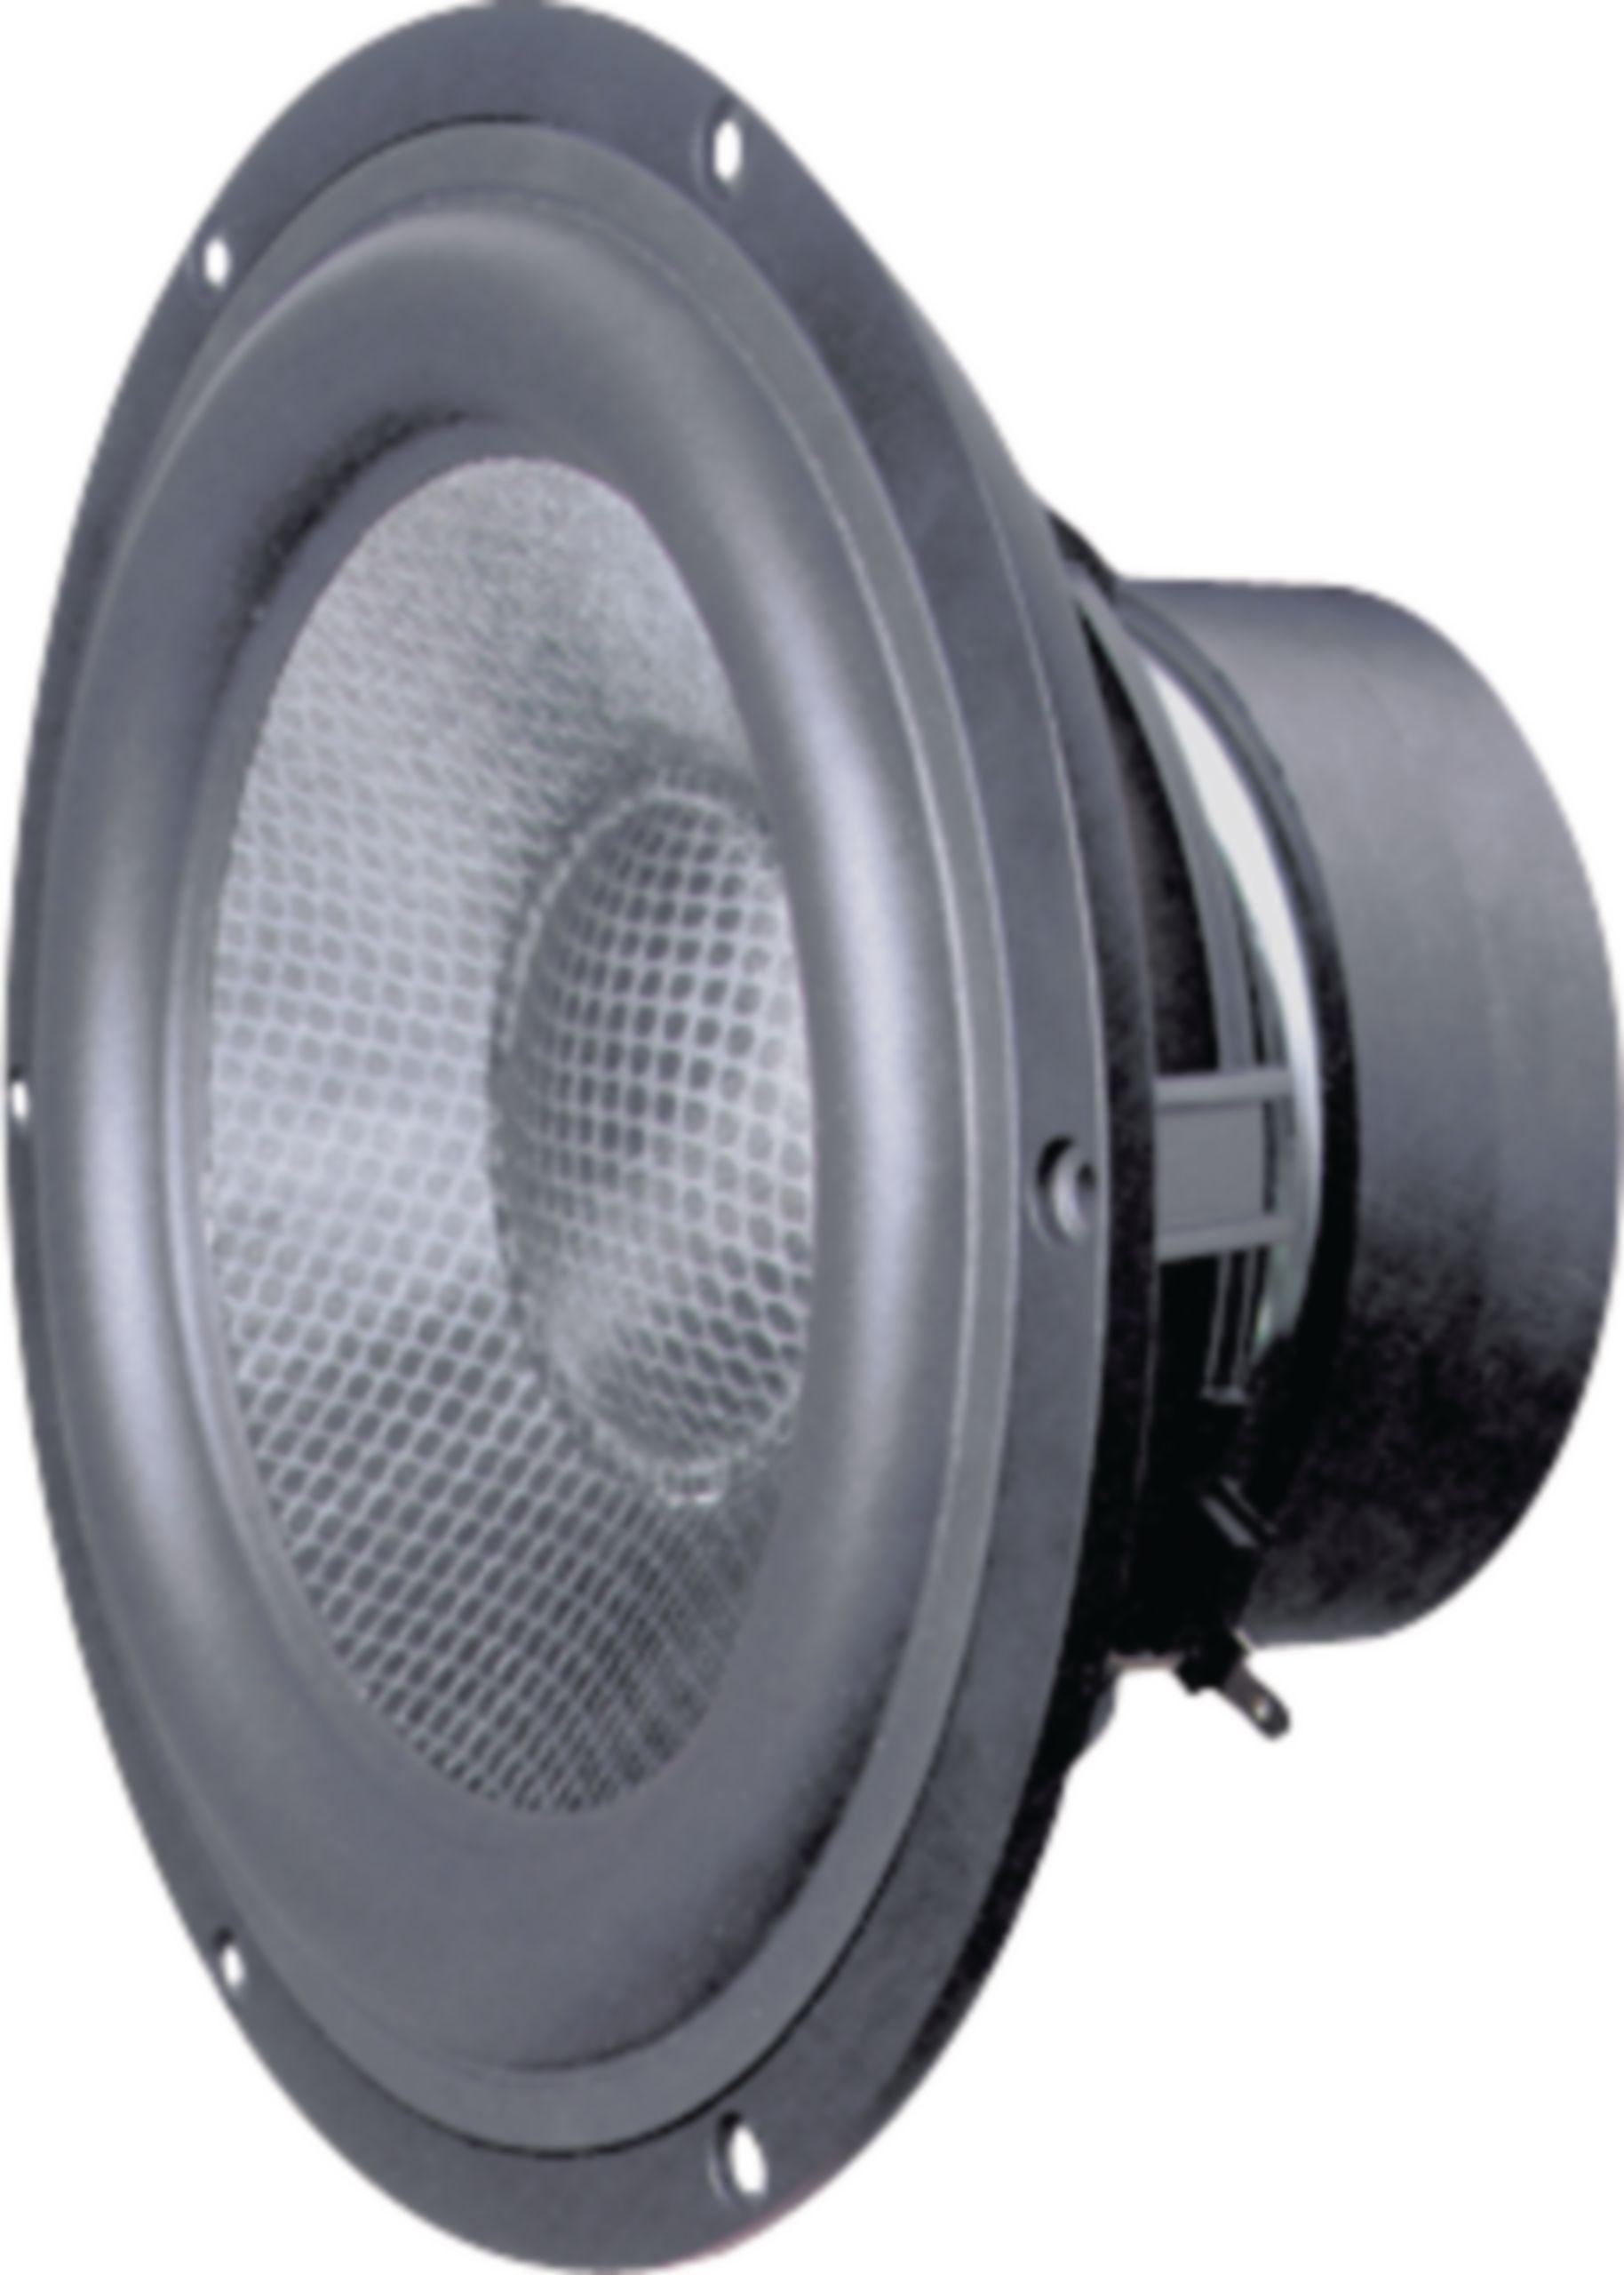 Basový reproduktor 8 Ohm 180 W Visaton, VS-TIW200XS